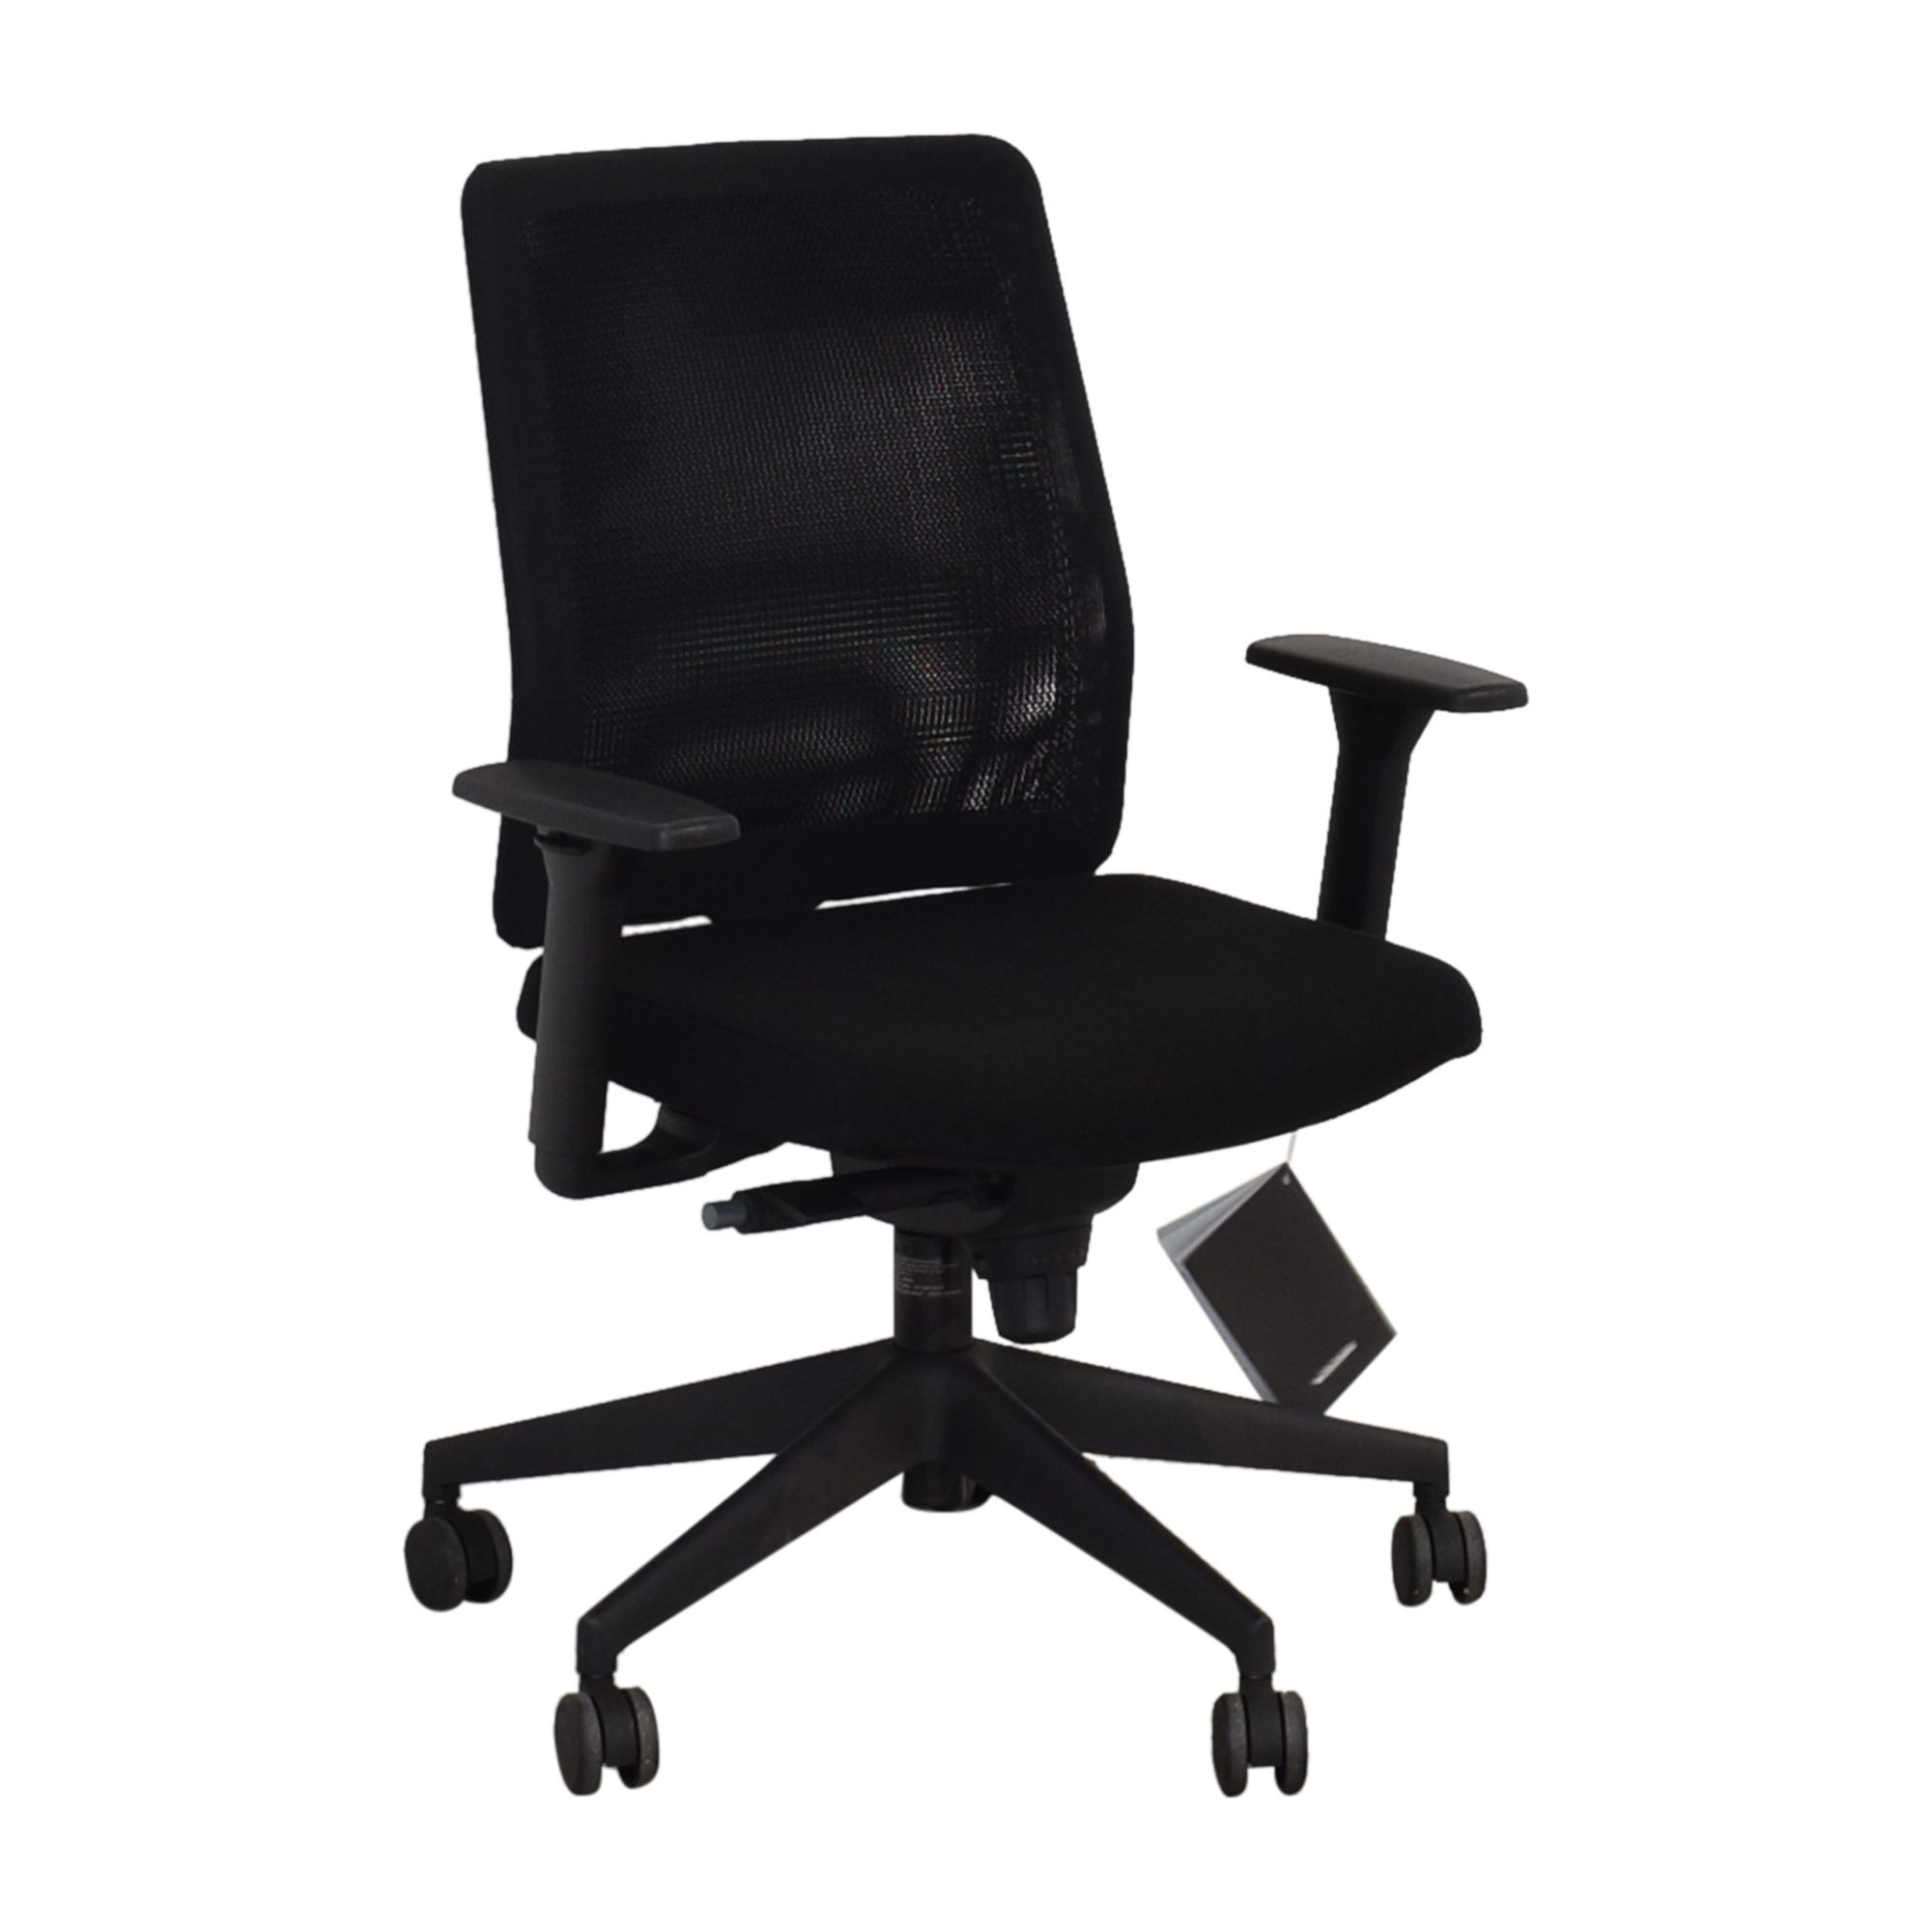 Koleksiyon Koleksiyon Dastan Operational Chair black